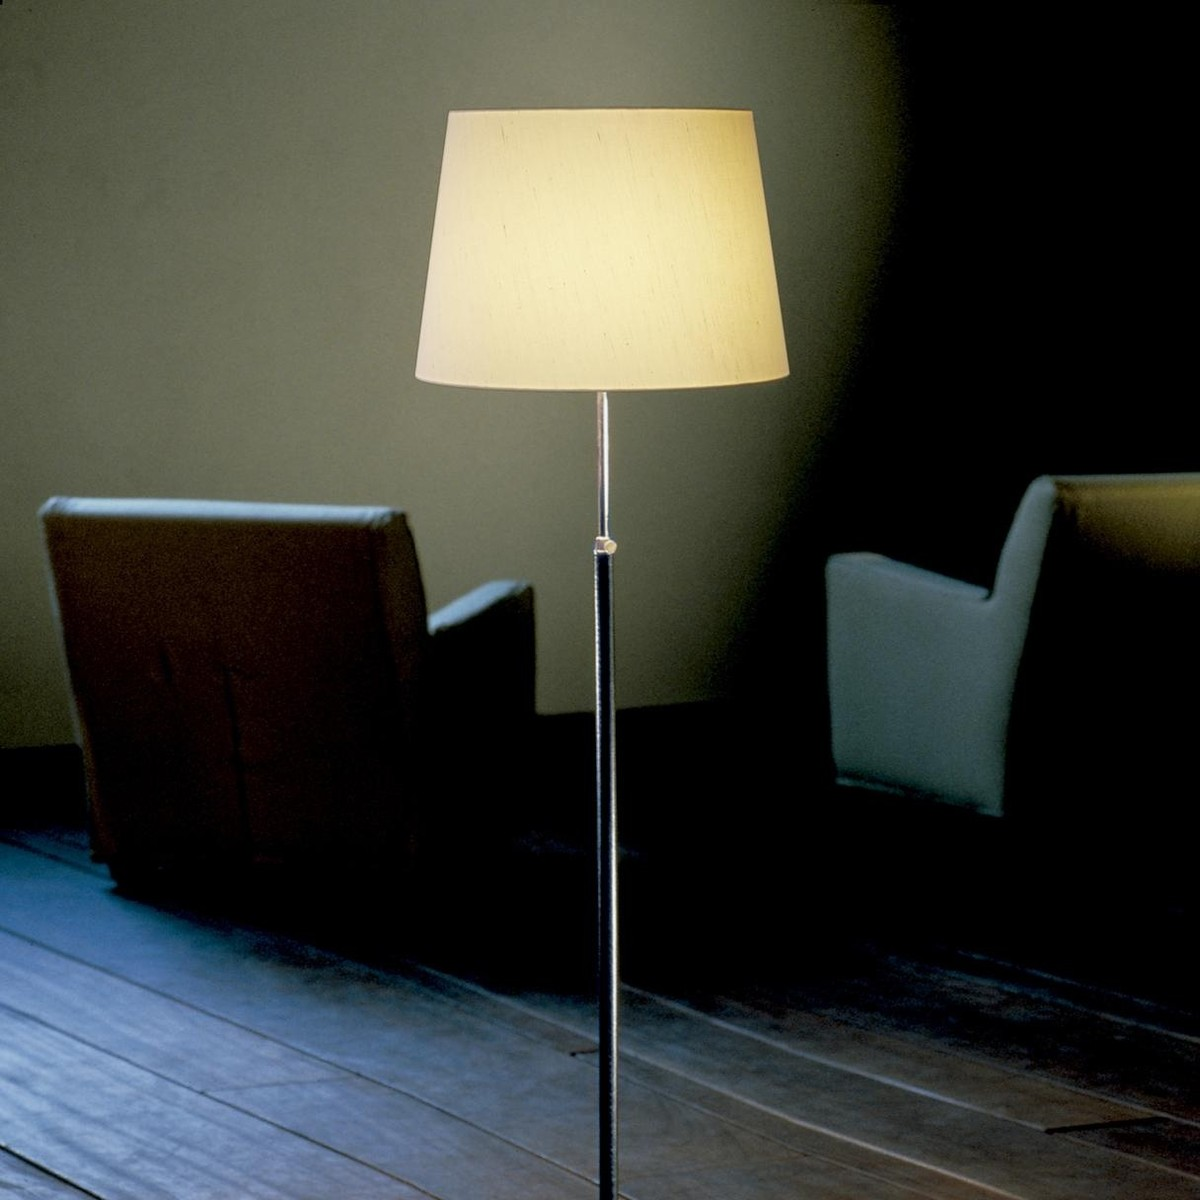 pie de salon floor lamp santa cole. Black Bedroom Furniture Sets. Home Design Ideas